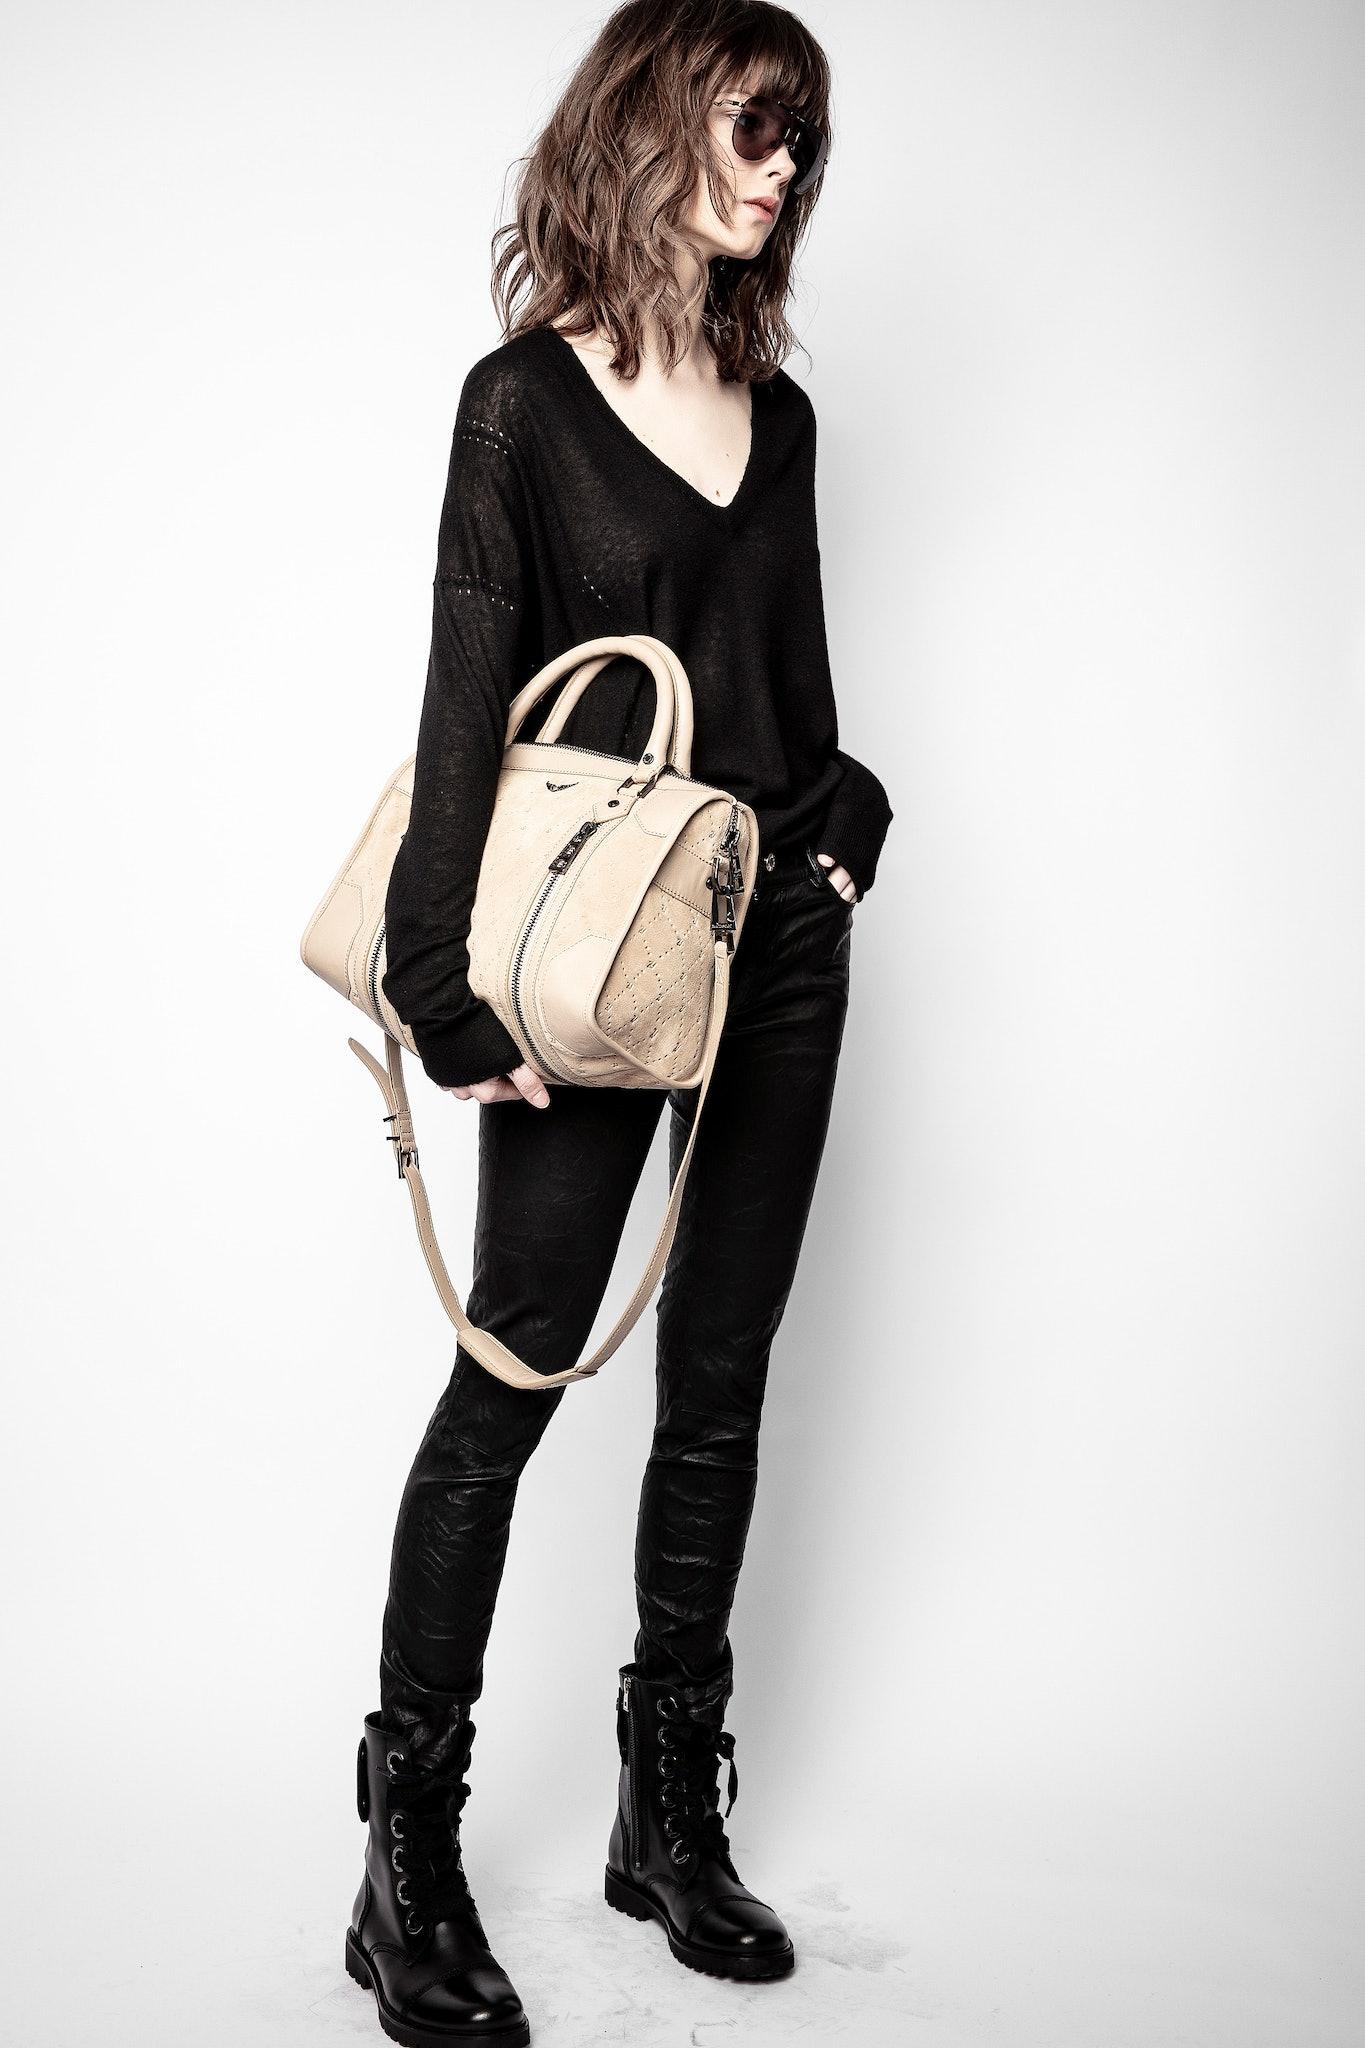 Sunny Medium #2 ZV Embossed Suede Bag